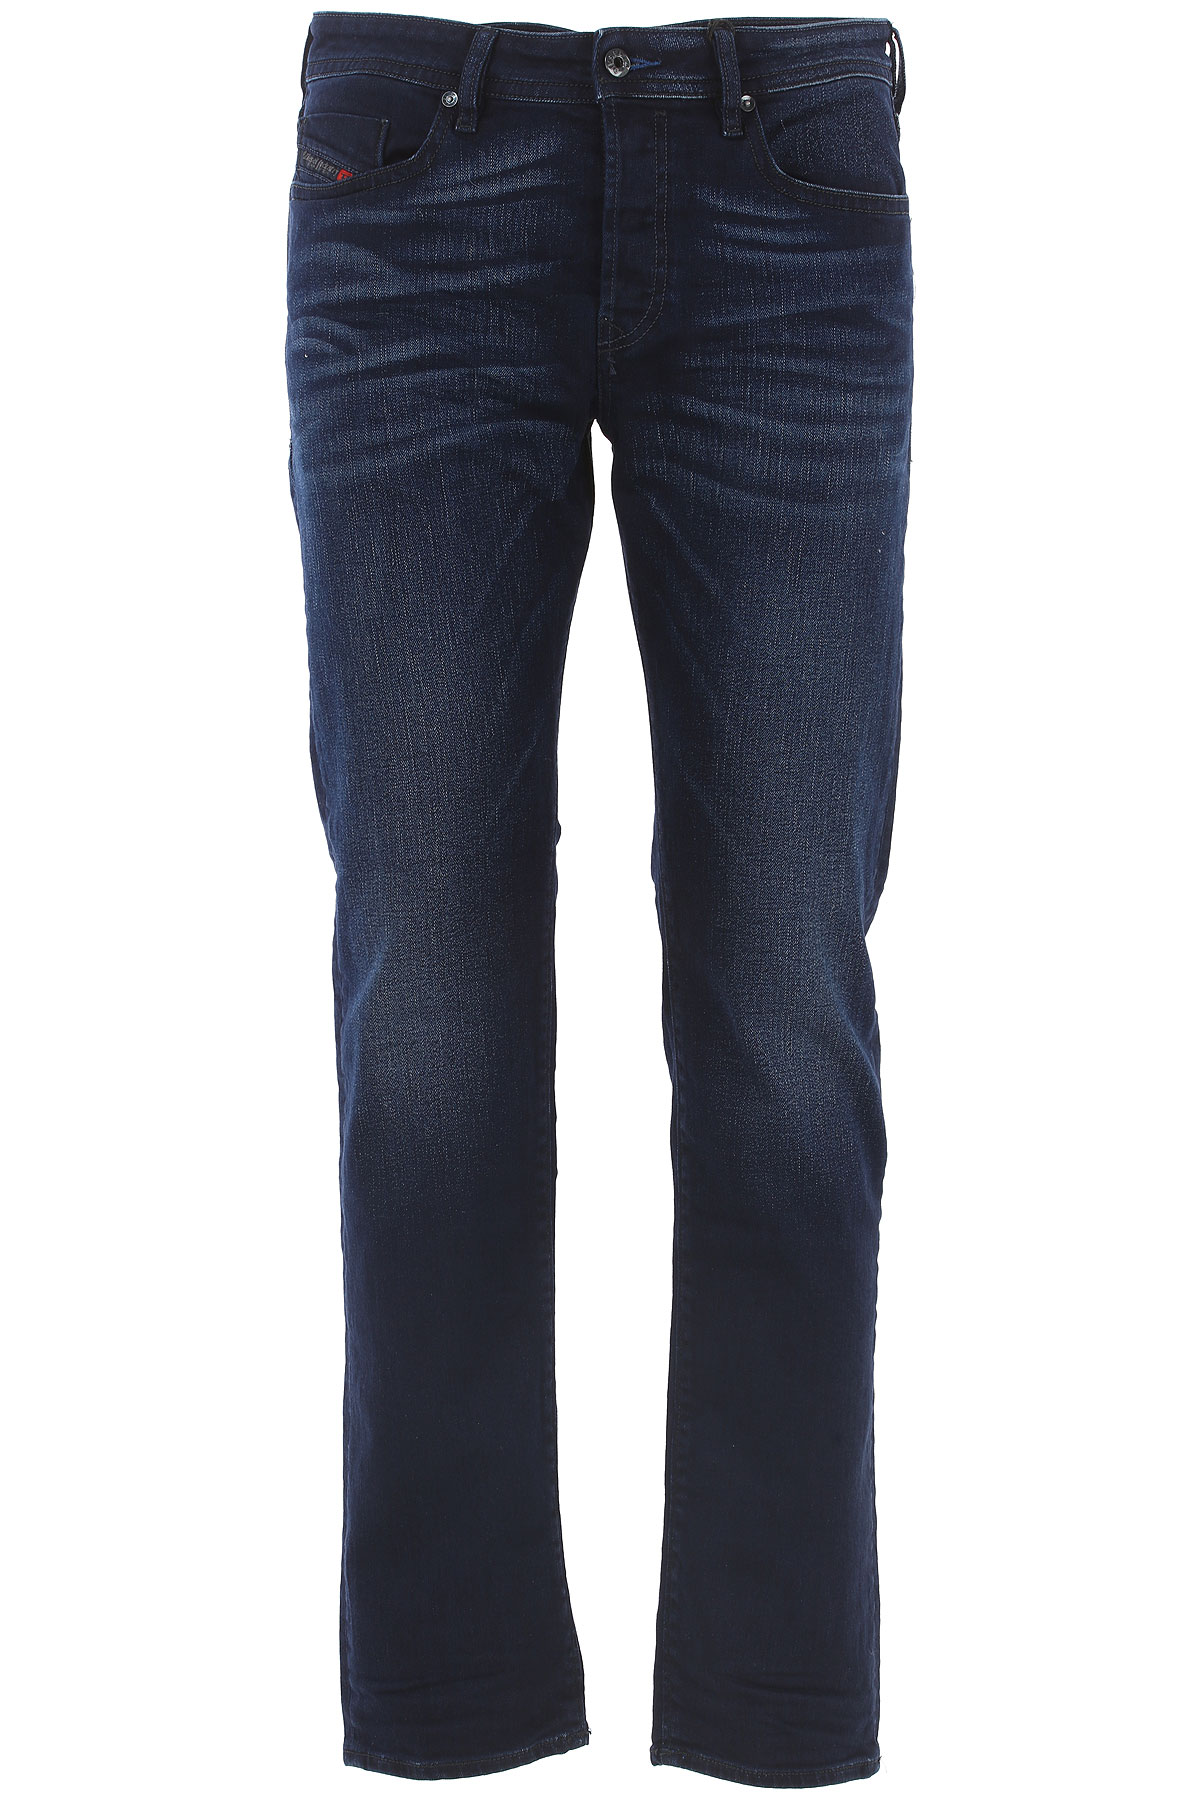 Diesel Jeans On Sale in Outlet, Buster, Dark Blue Denim, Cotton, 2017, 31 32 33 38 USA-410102